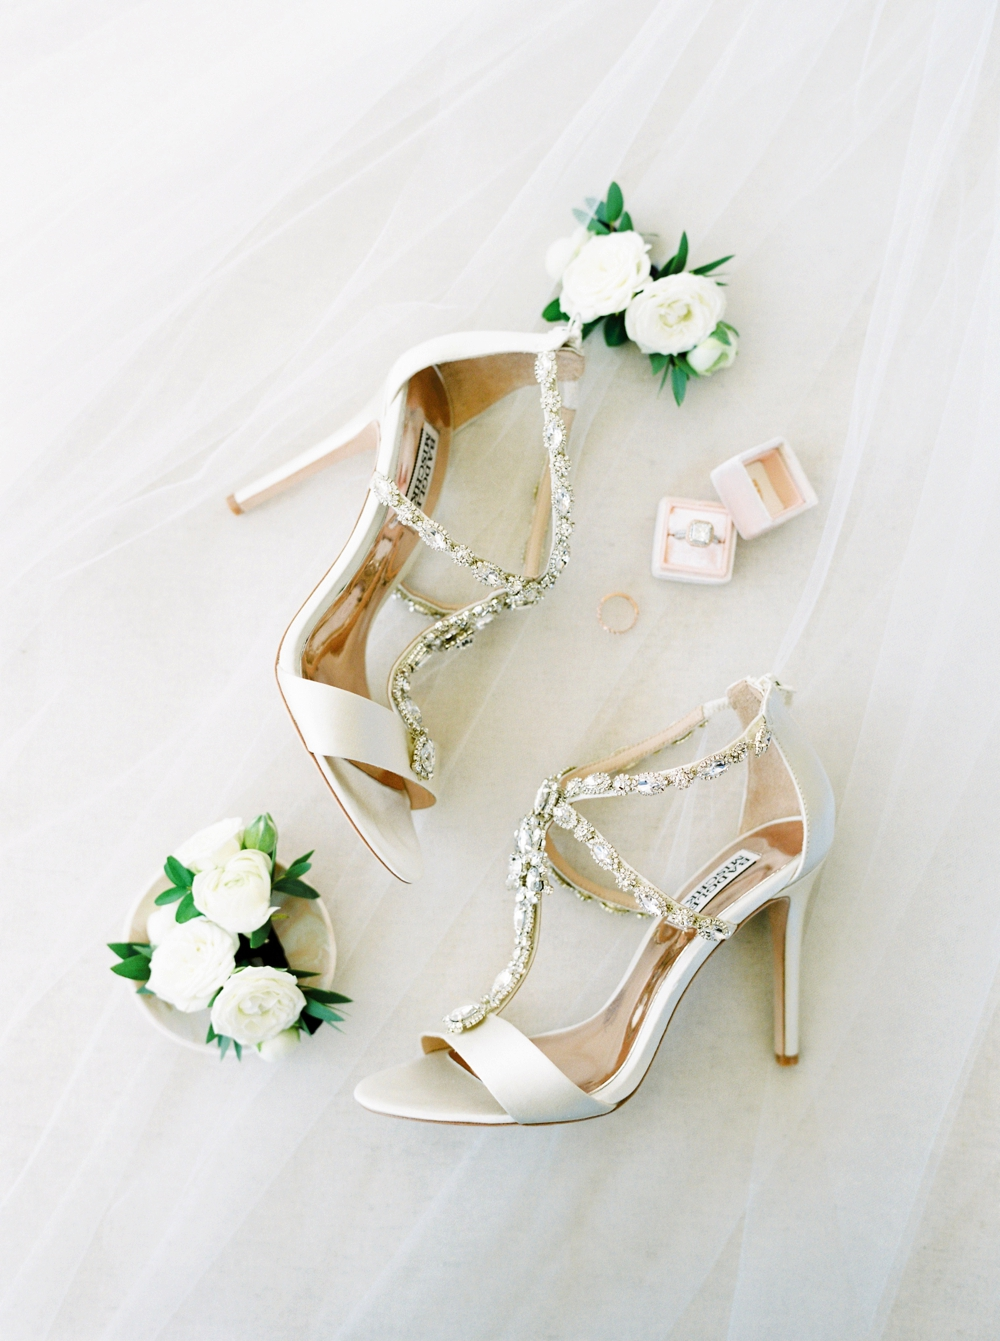 Bride Getting ready wedding details badgley mischka wedding shoes | Banff Wedding Photographers | Justine Milton fine art film photography